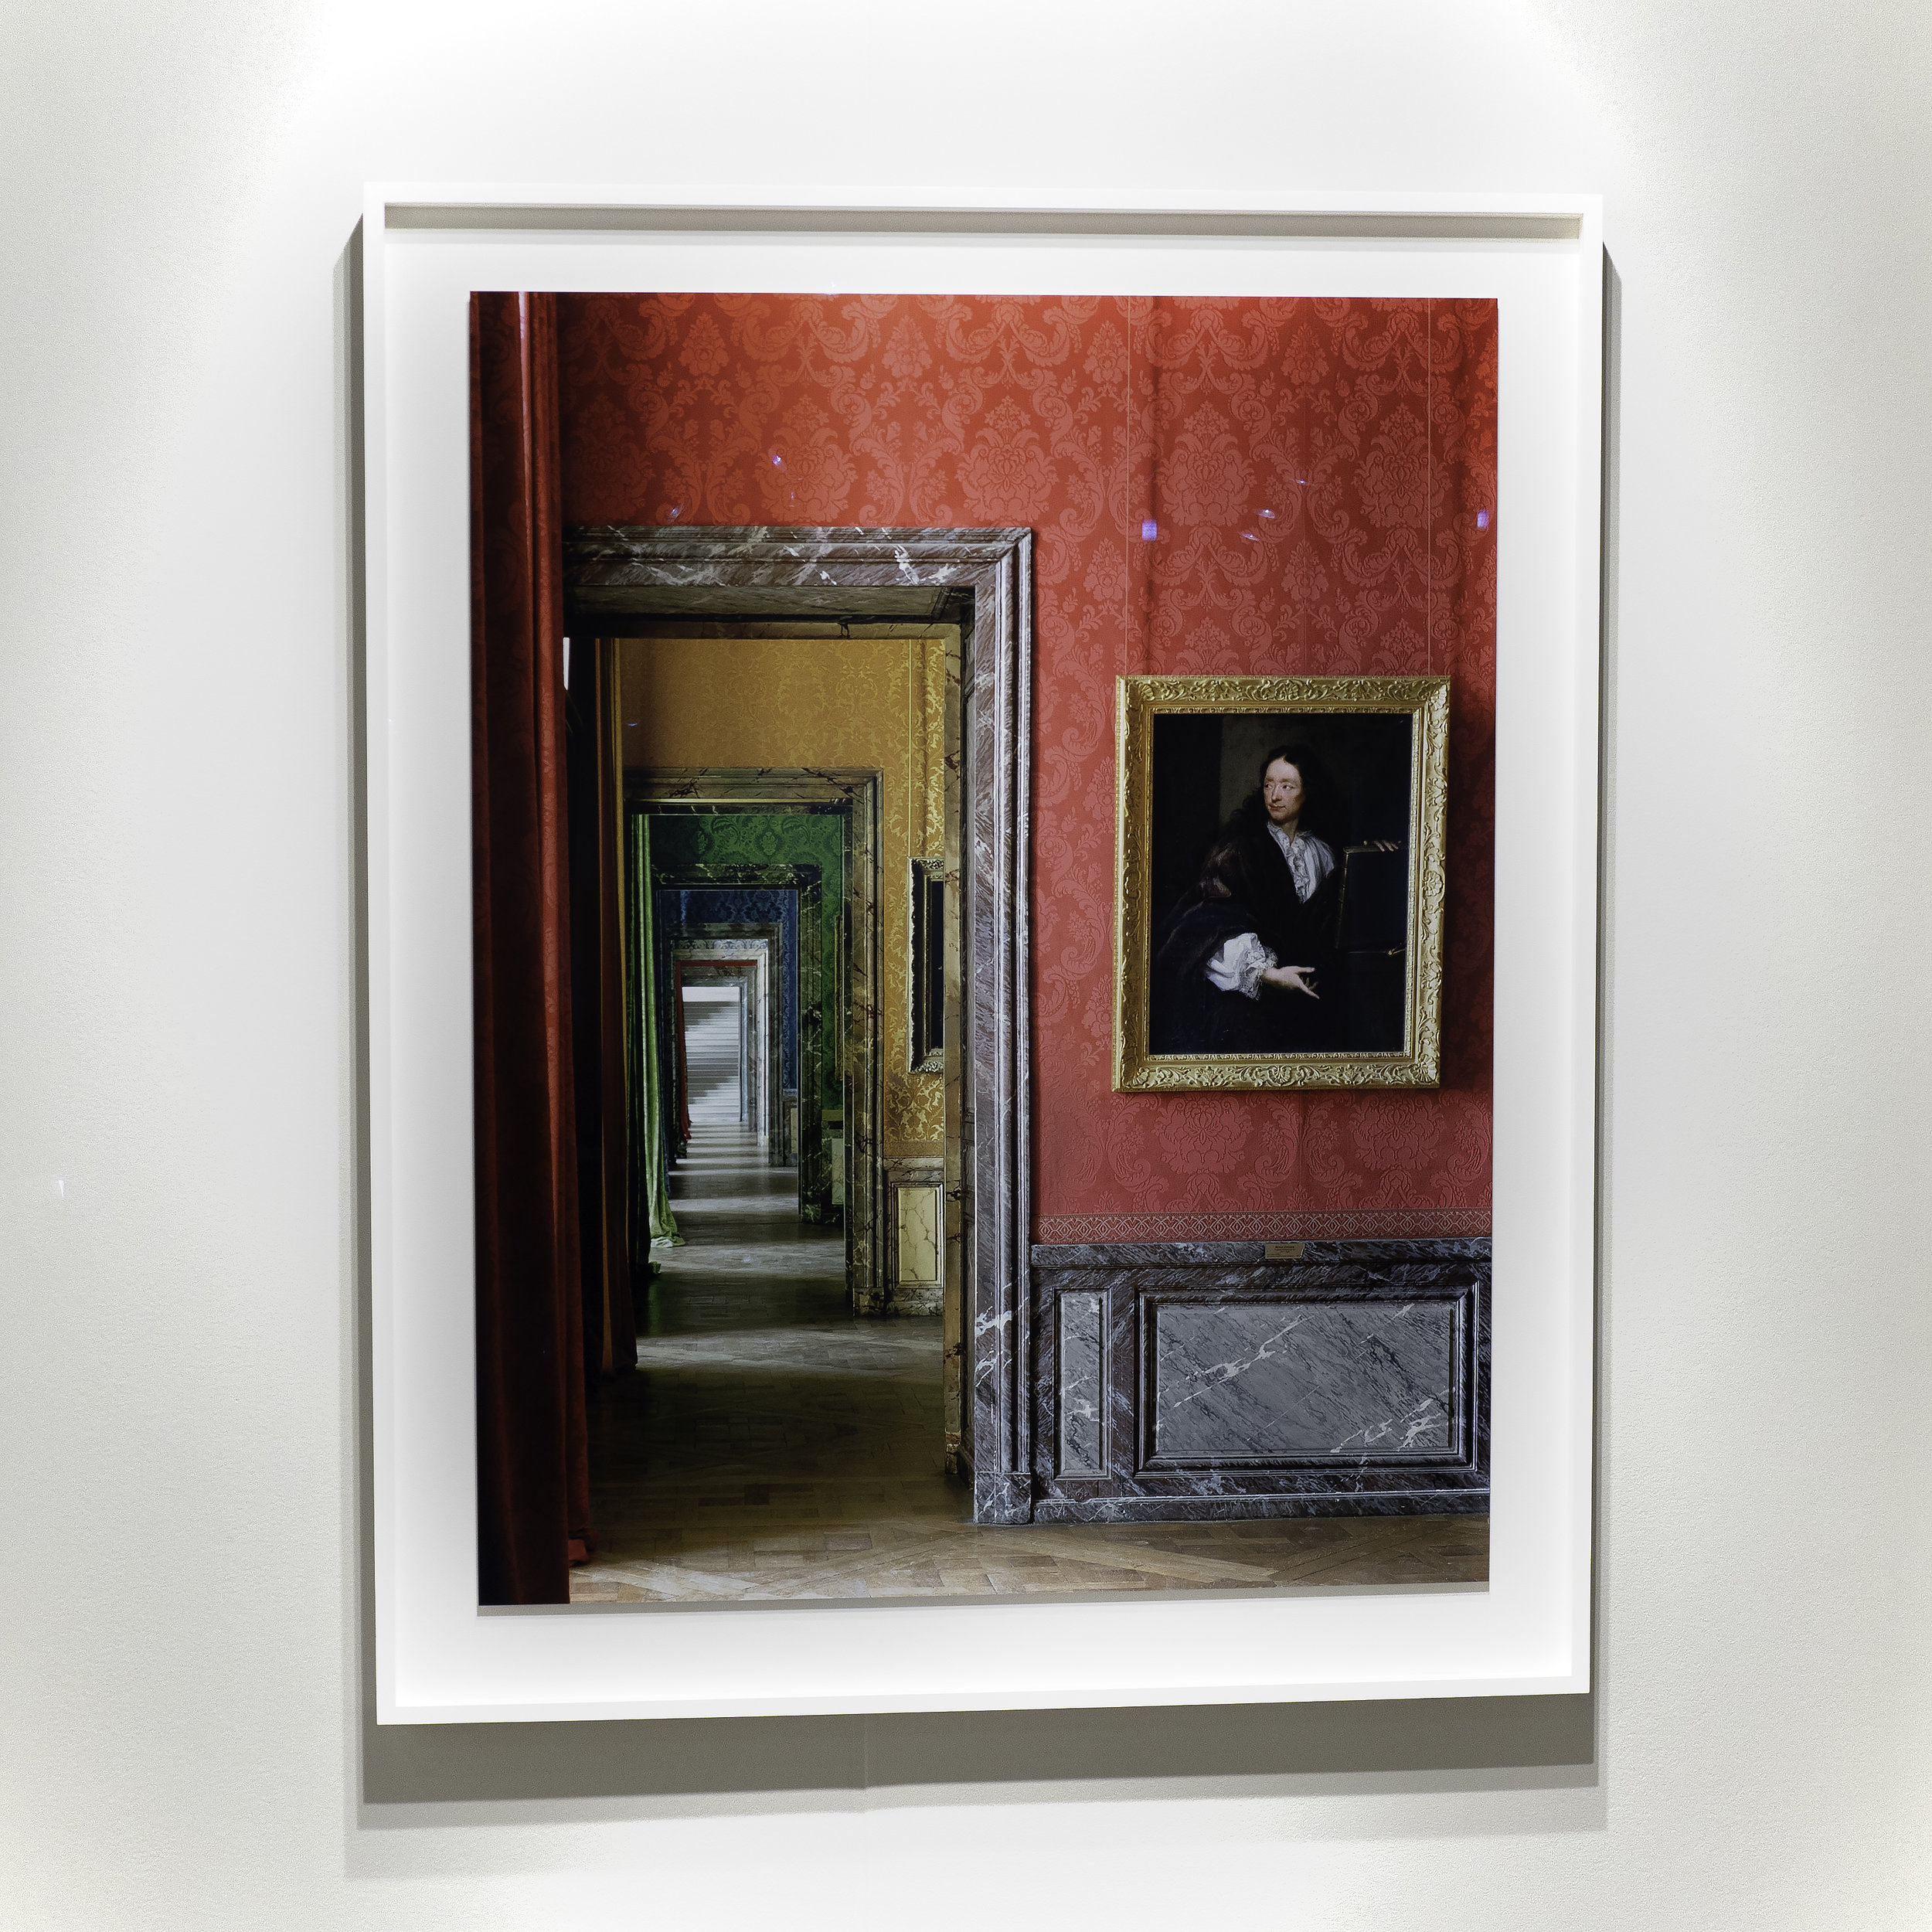 Photo of Robert Polidori's work © Lin Witte